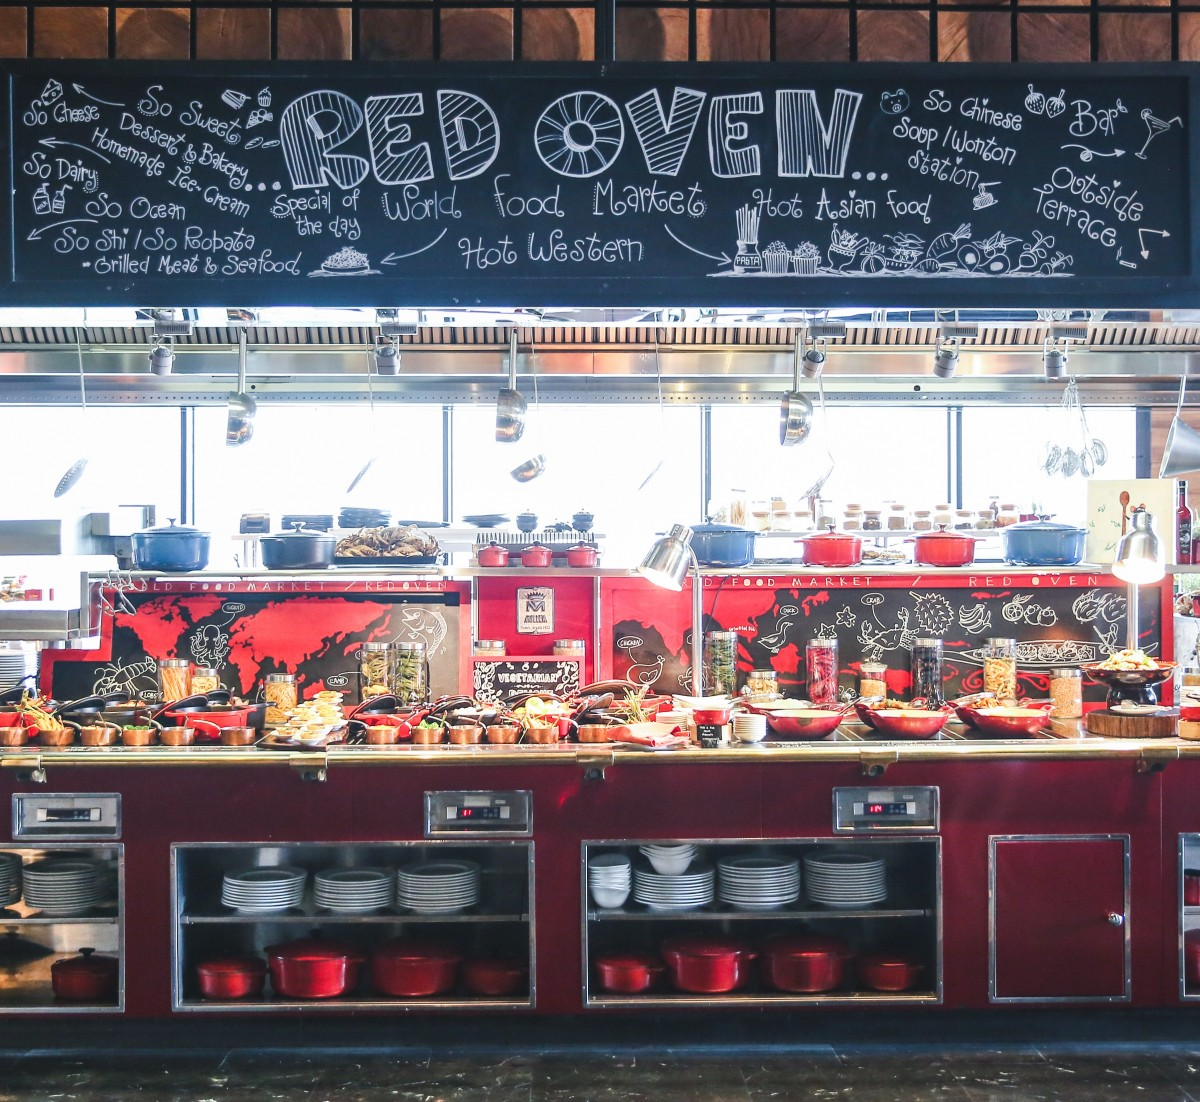 SO-Sofitel-Bangkok-Red-Oven-Buffet